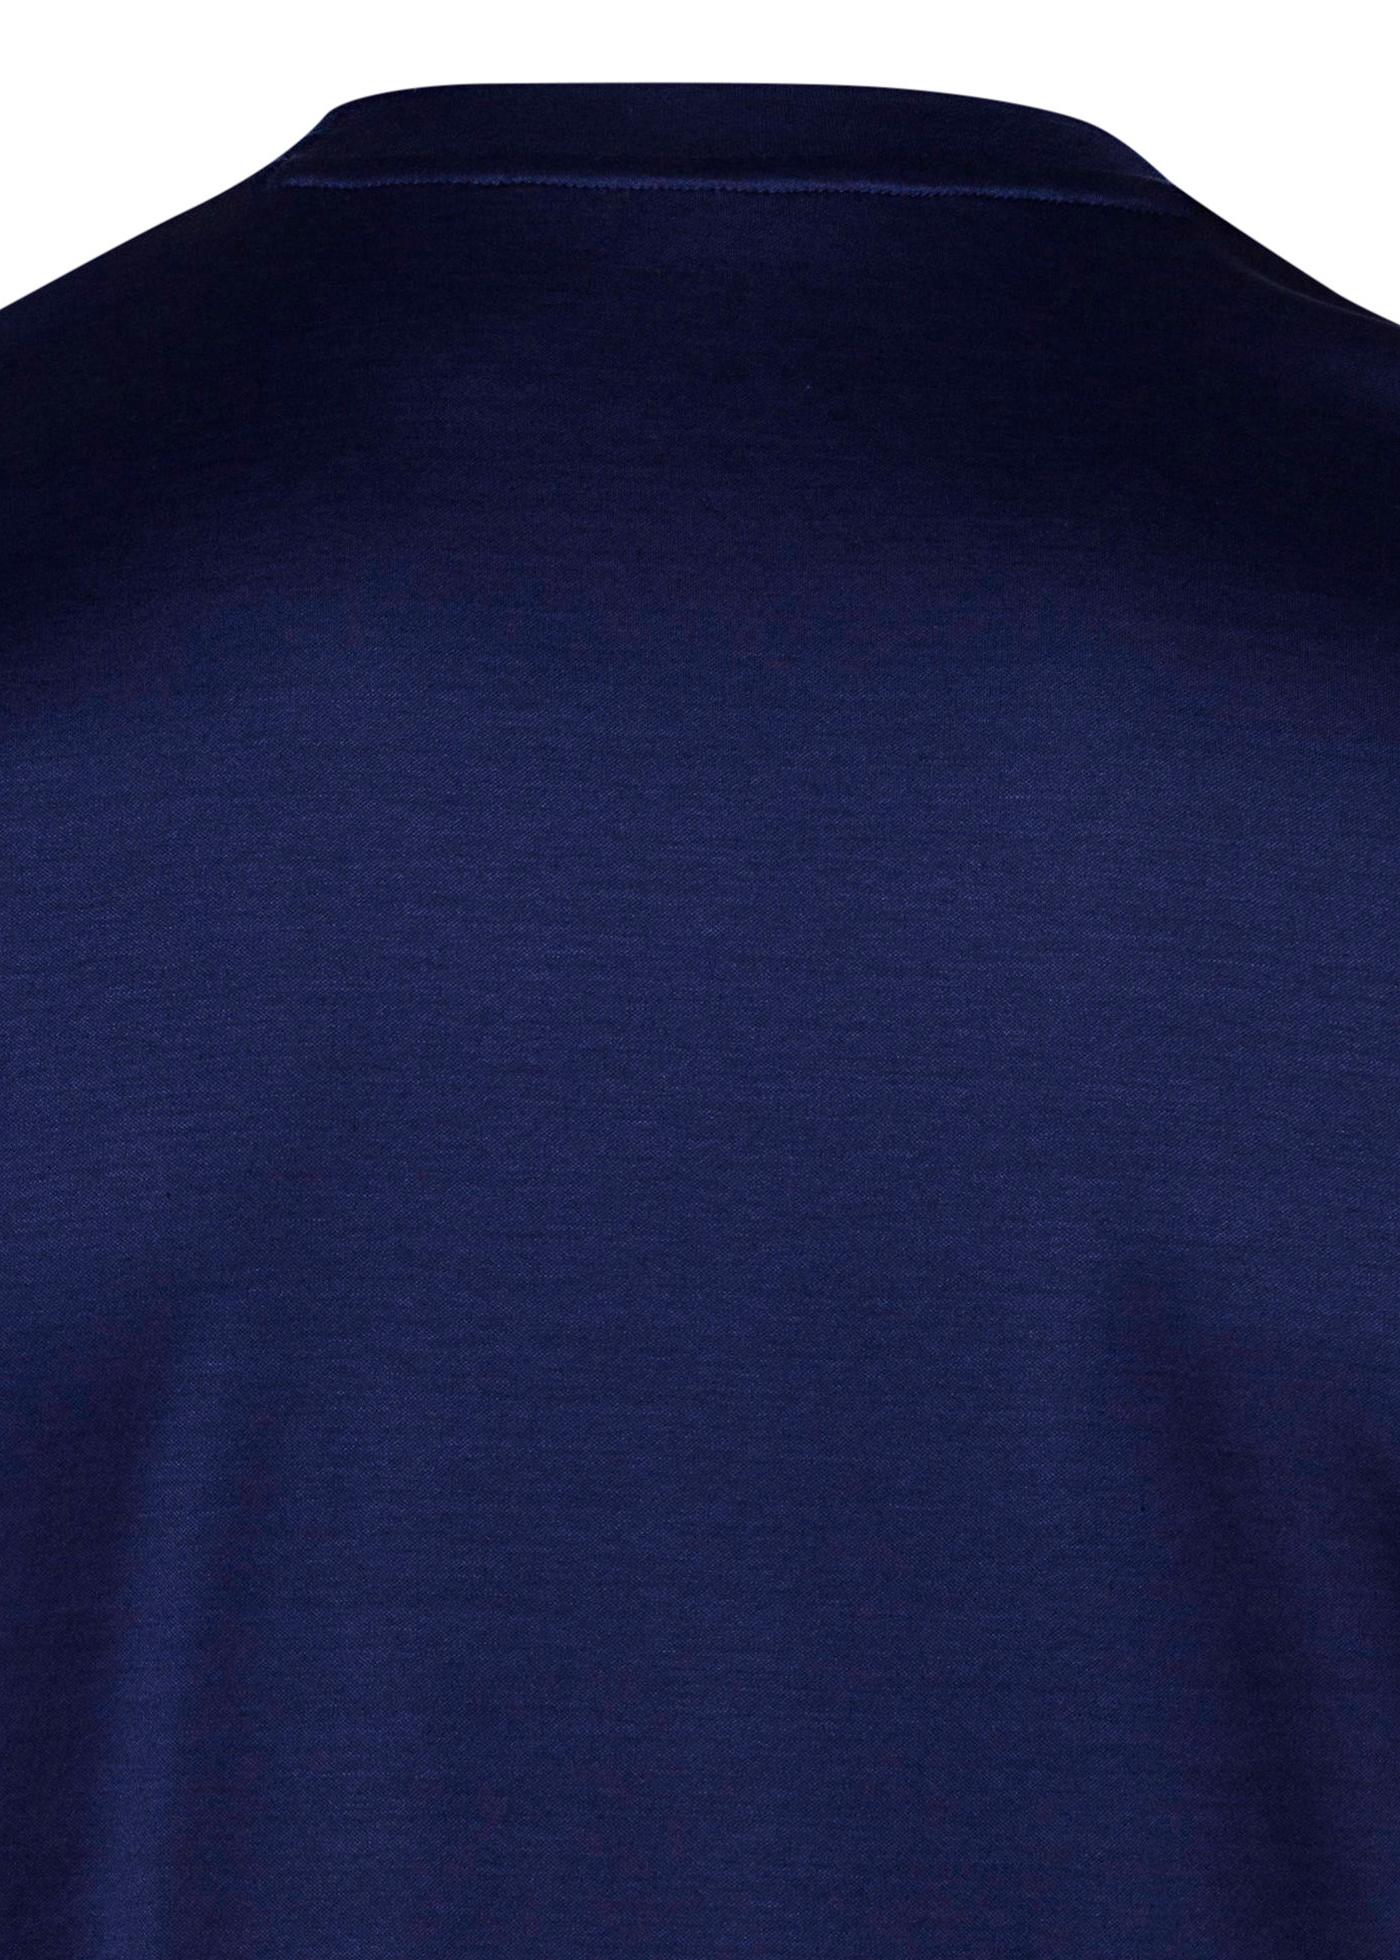 1000023562609 Men shirt: Casual / Jersey image number 3